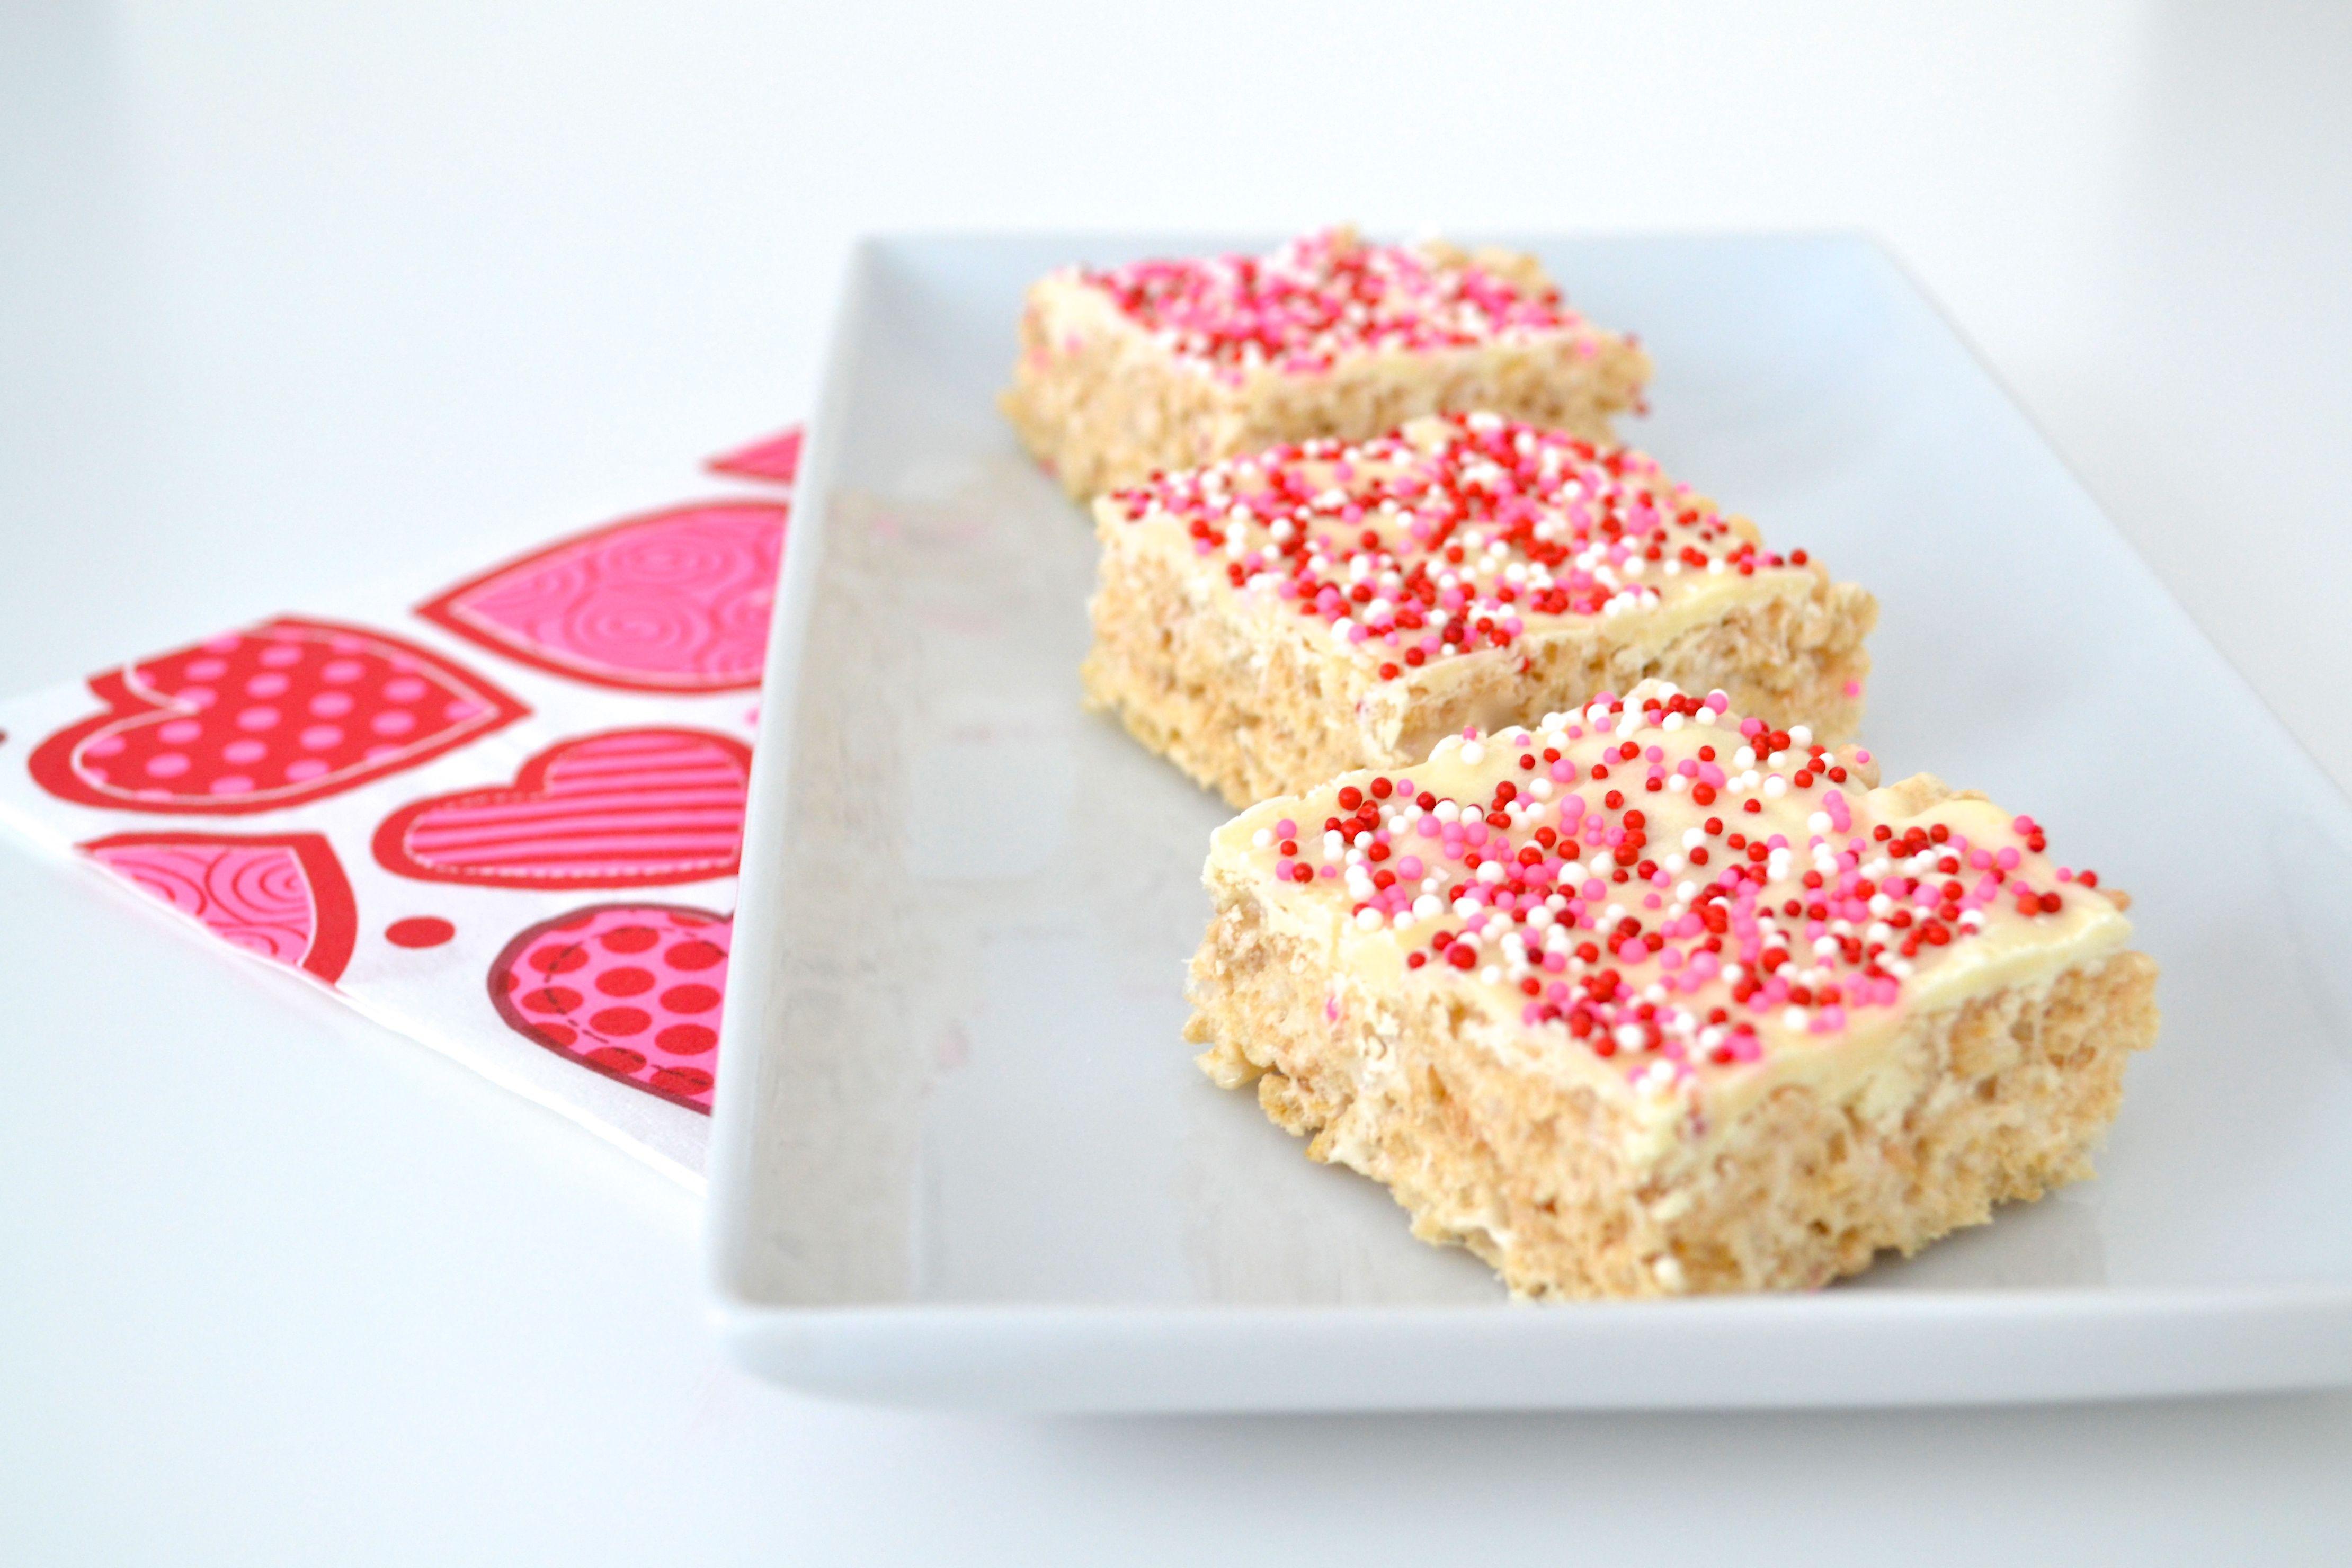 Arrocitos (Rice Krispy Treats